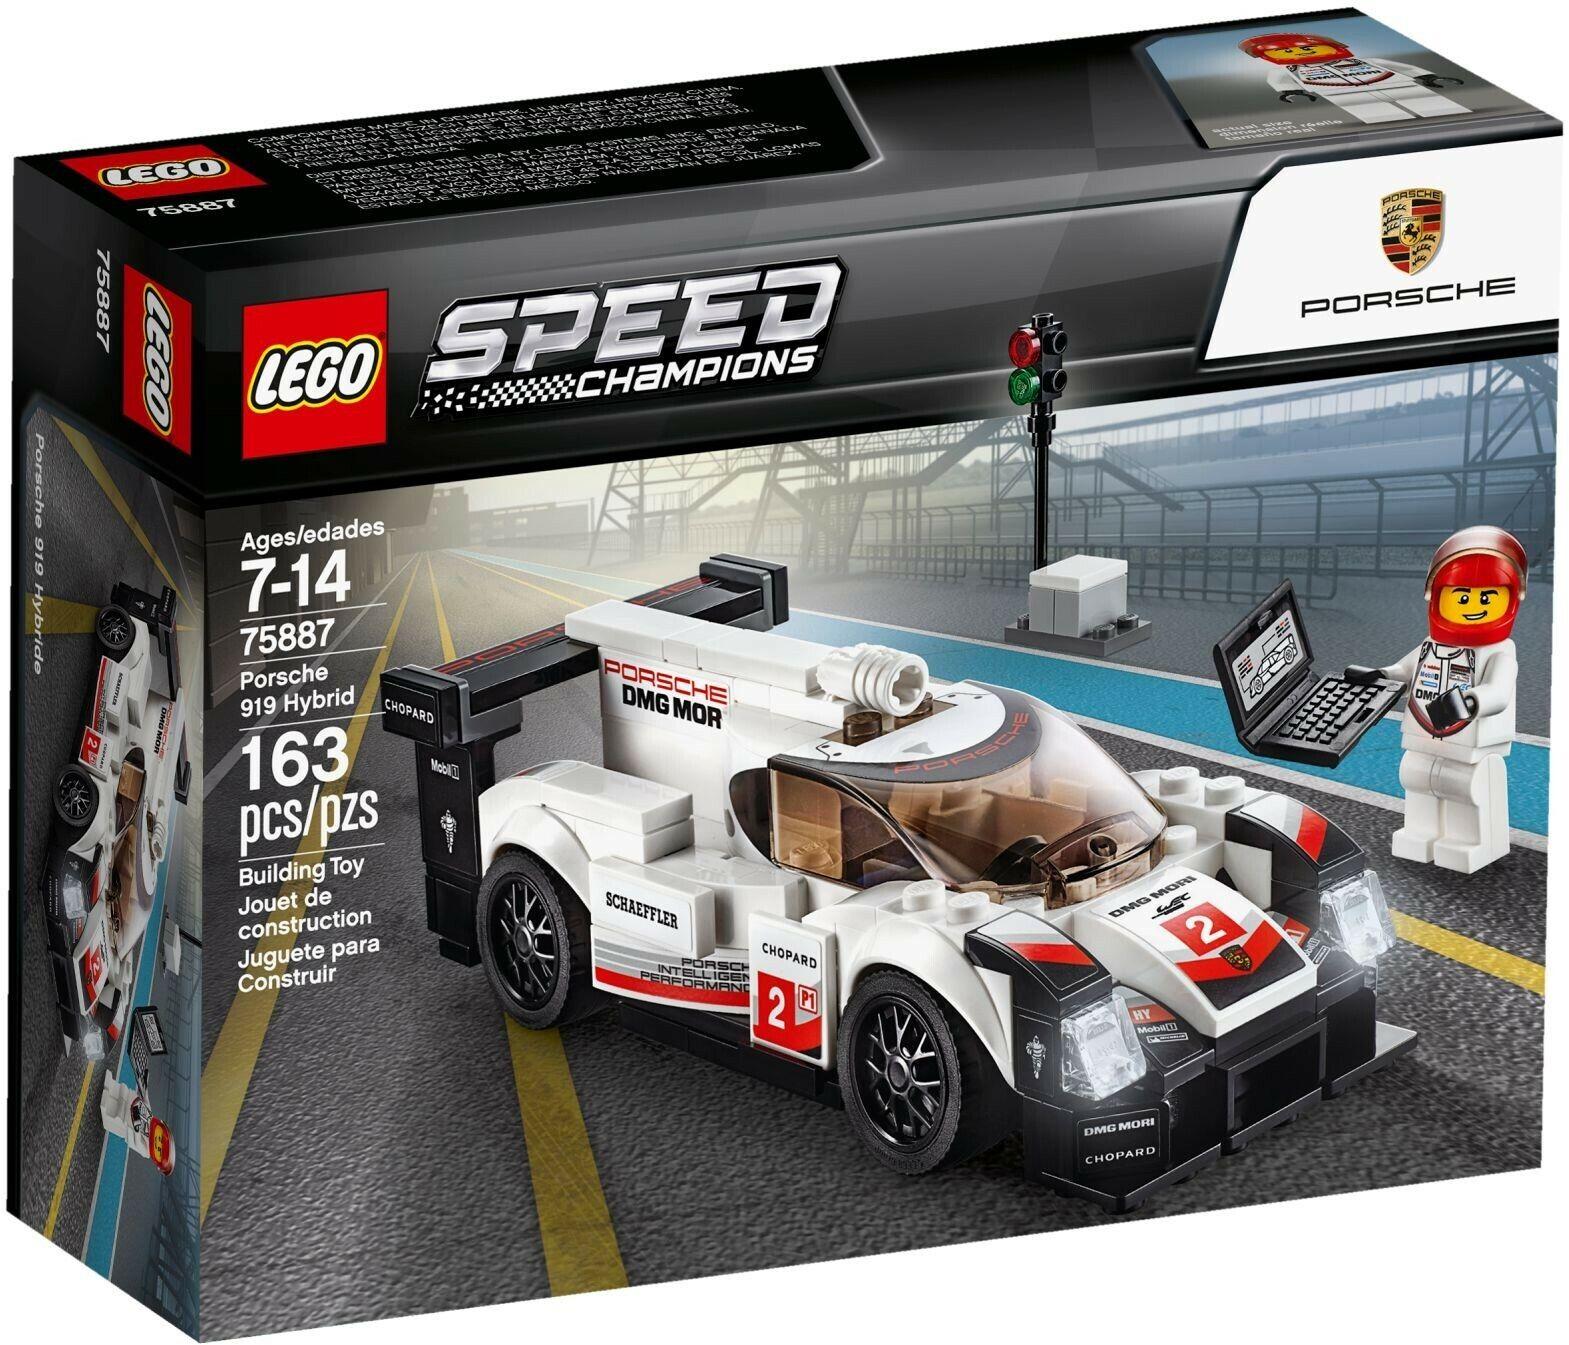 LEGO 75887 Speed Champions Porsche Porsche Porsche 919 Hybrid -DAMAGED BOX   - 9eaa6a